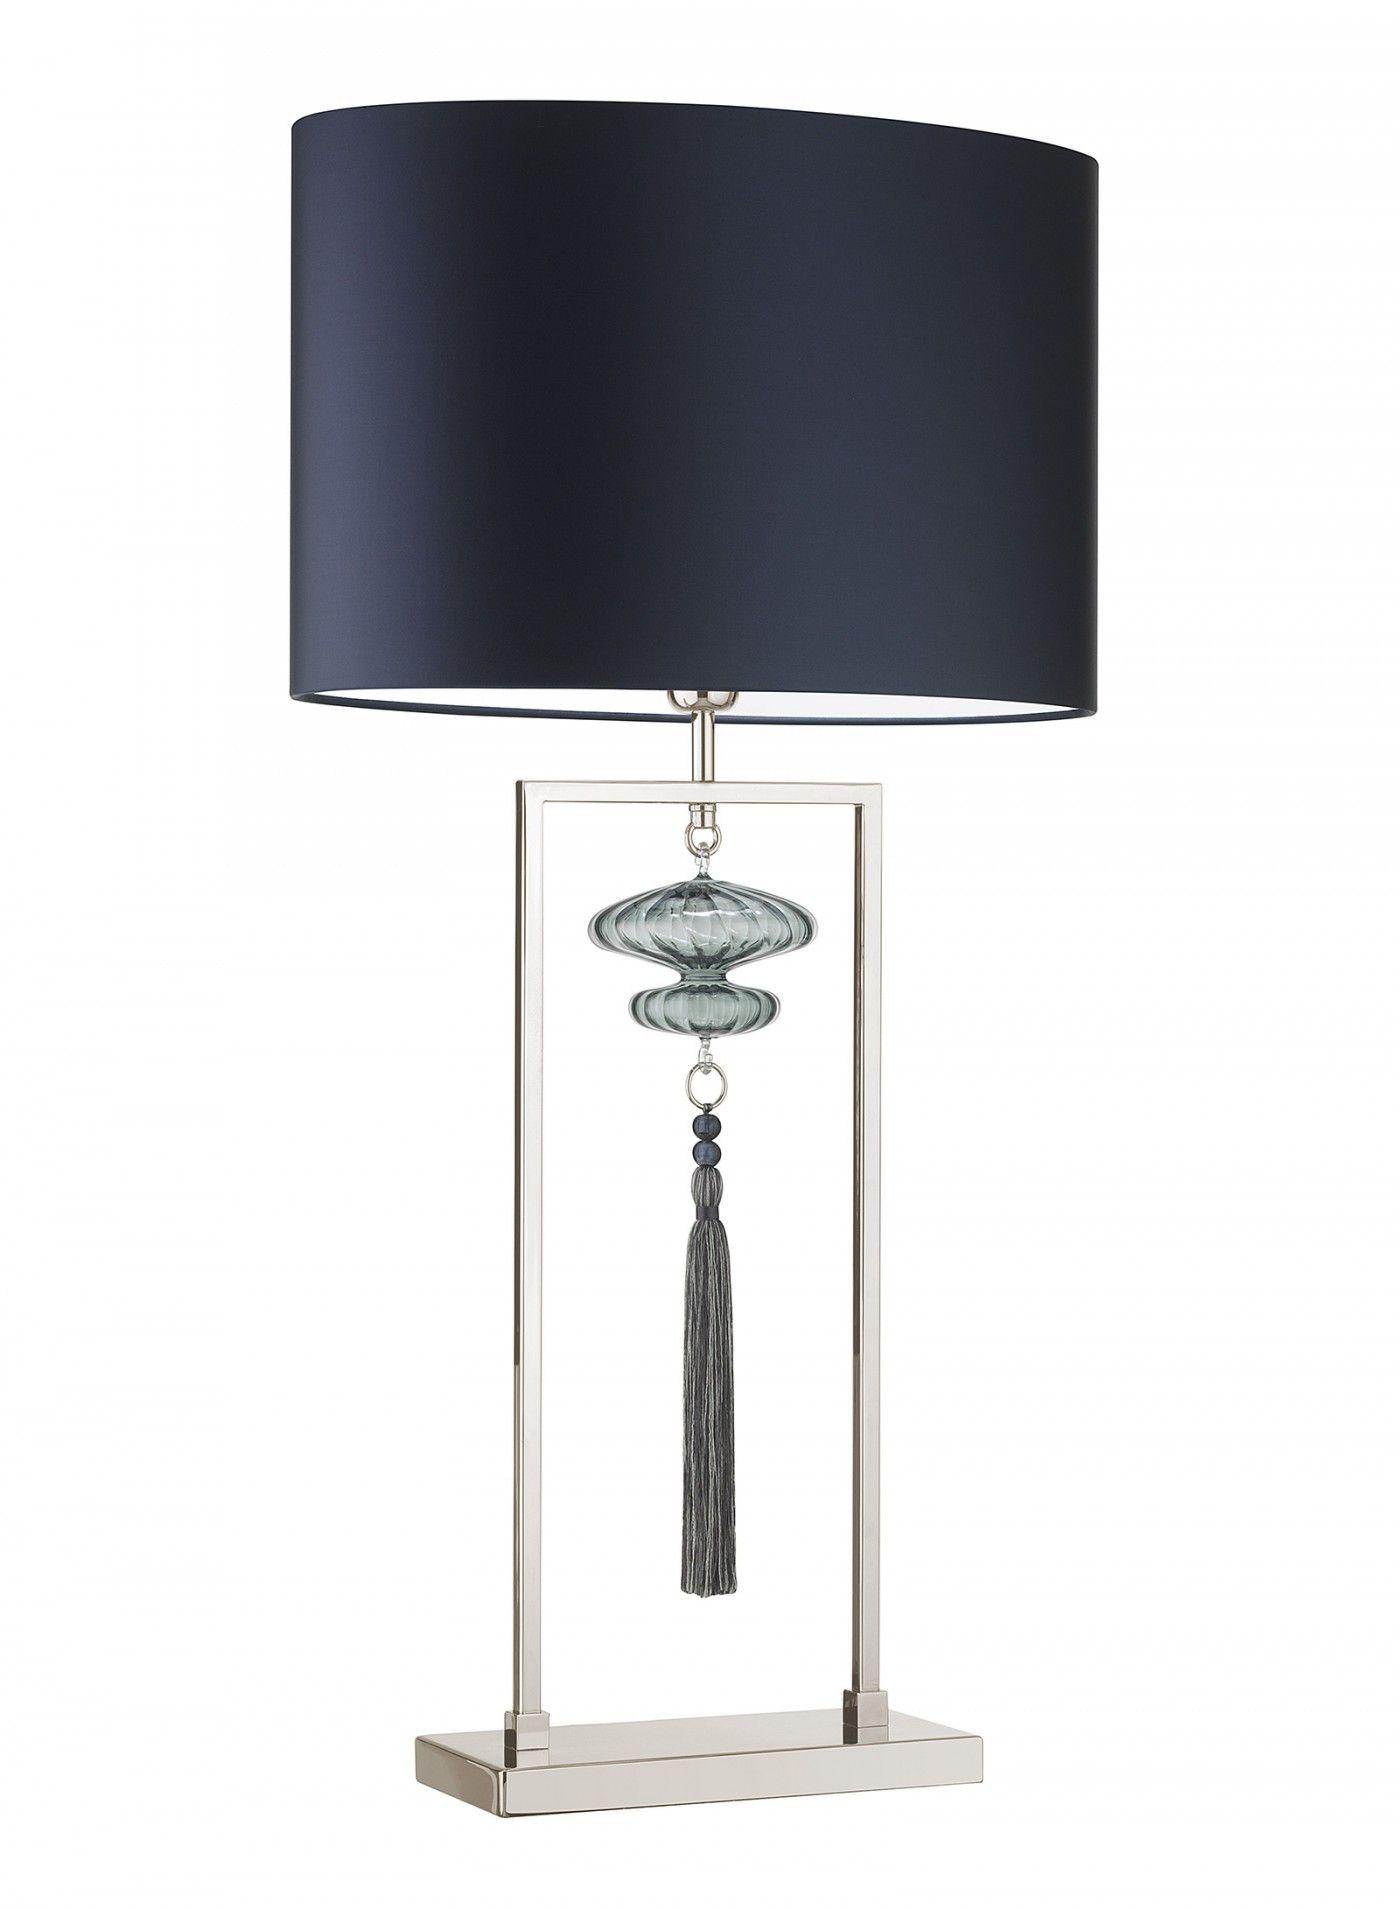 Heathfield Constance Large Nickel Opal Jade Table Lamp